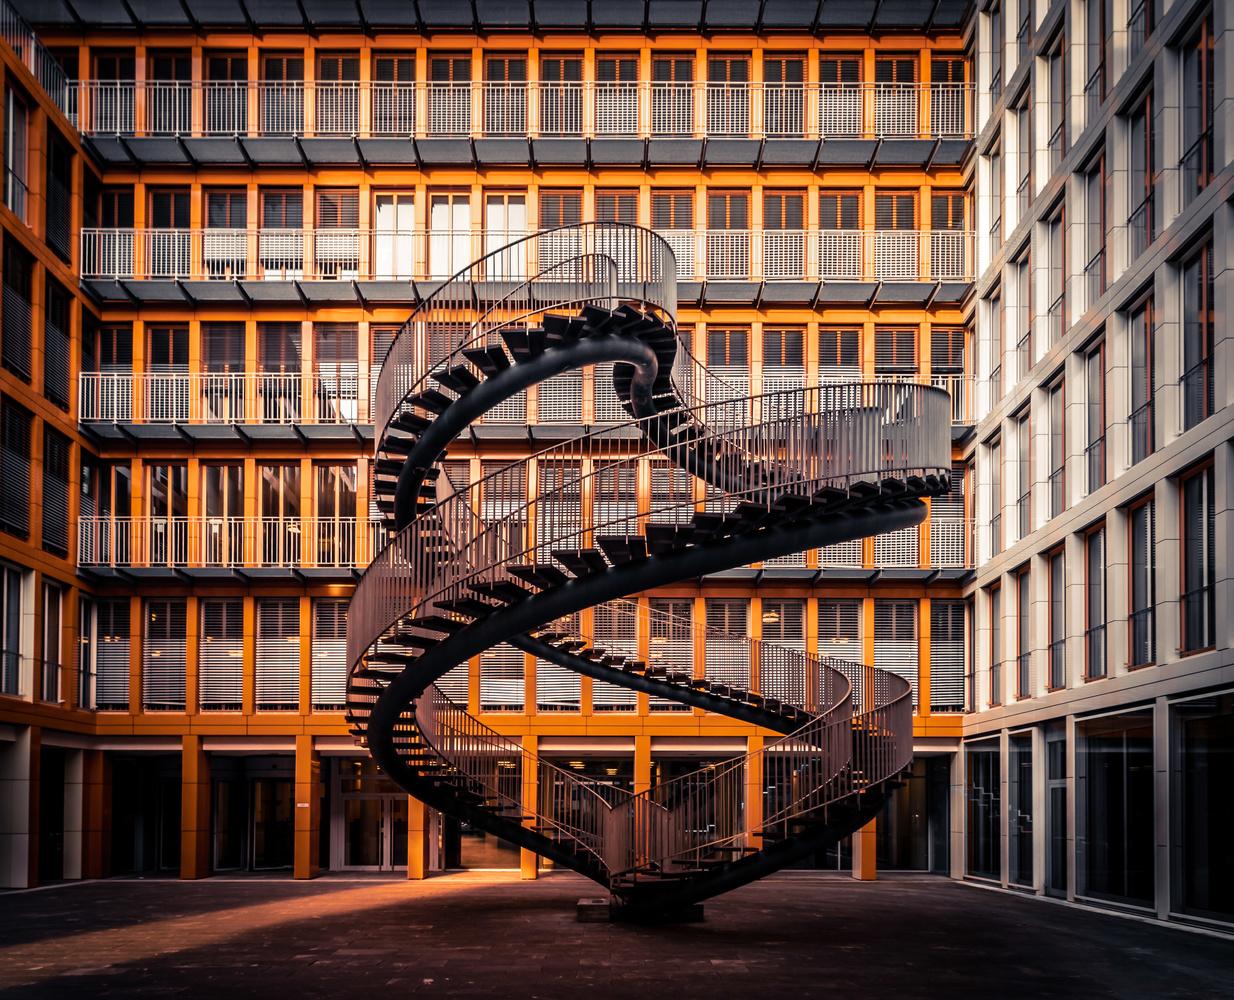 Infinite stairs by Alex K